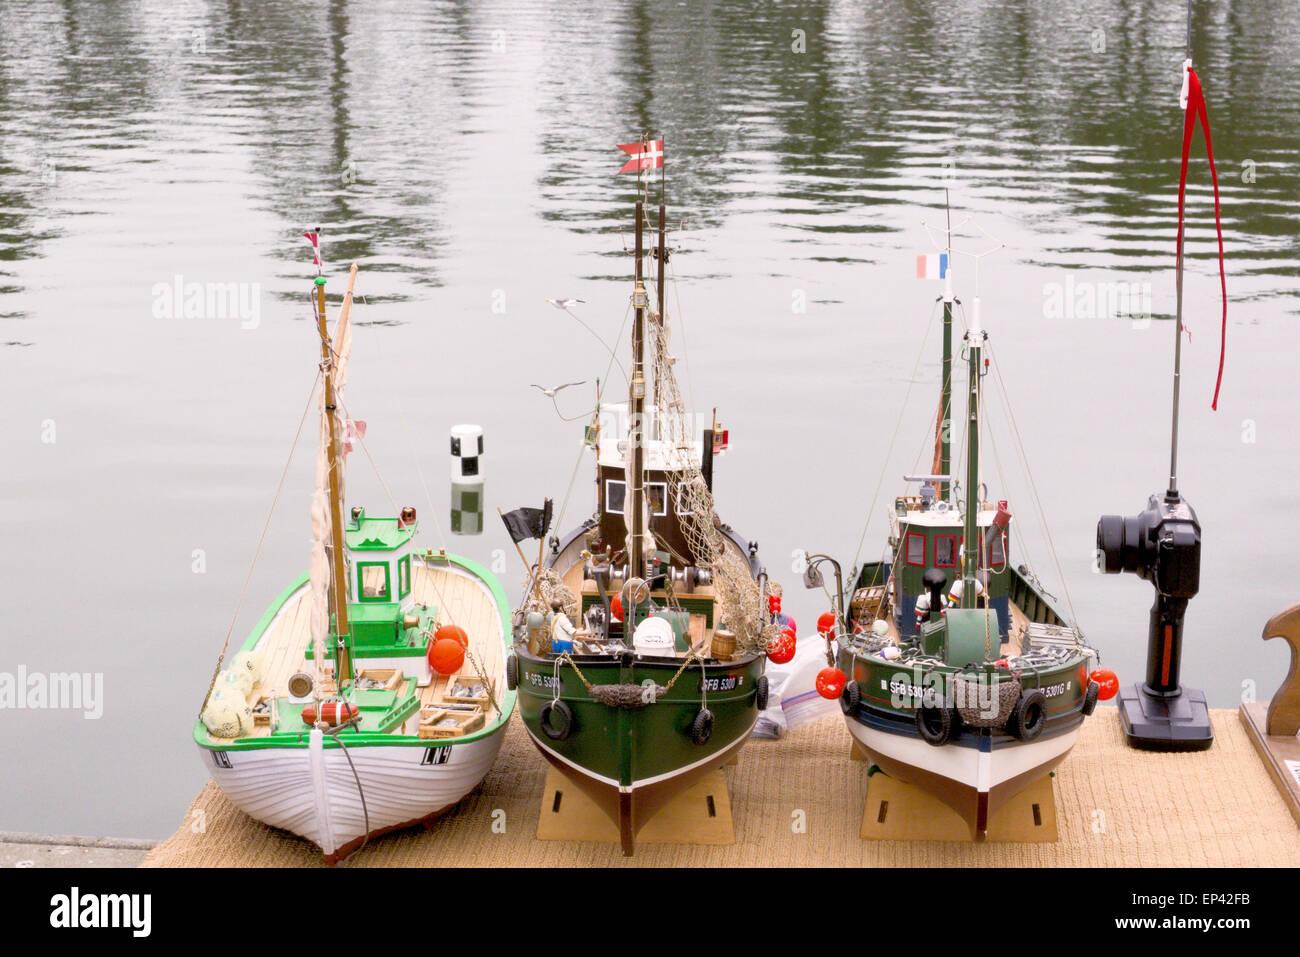 radio controlled model boats - Stock Image